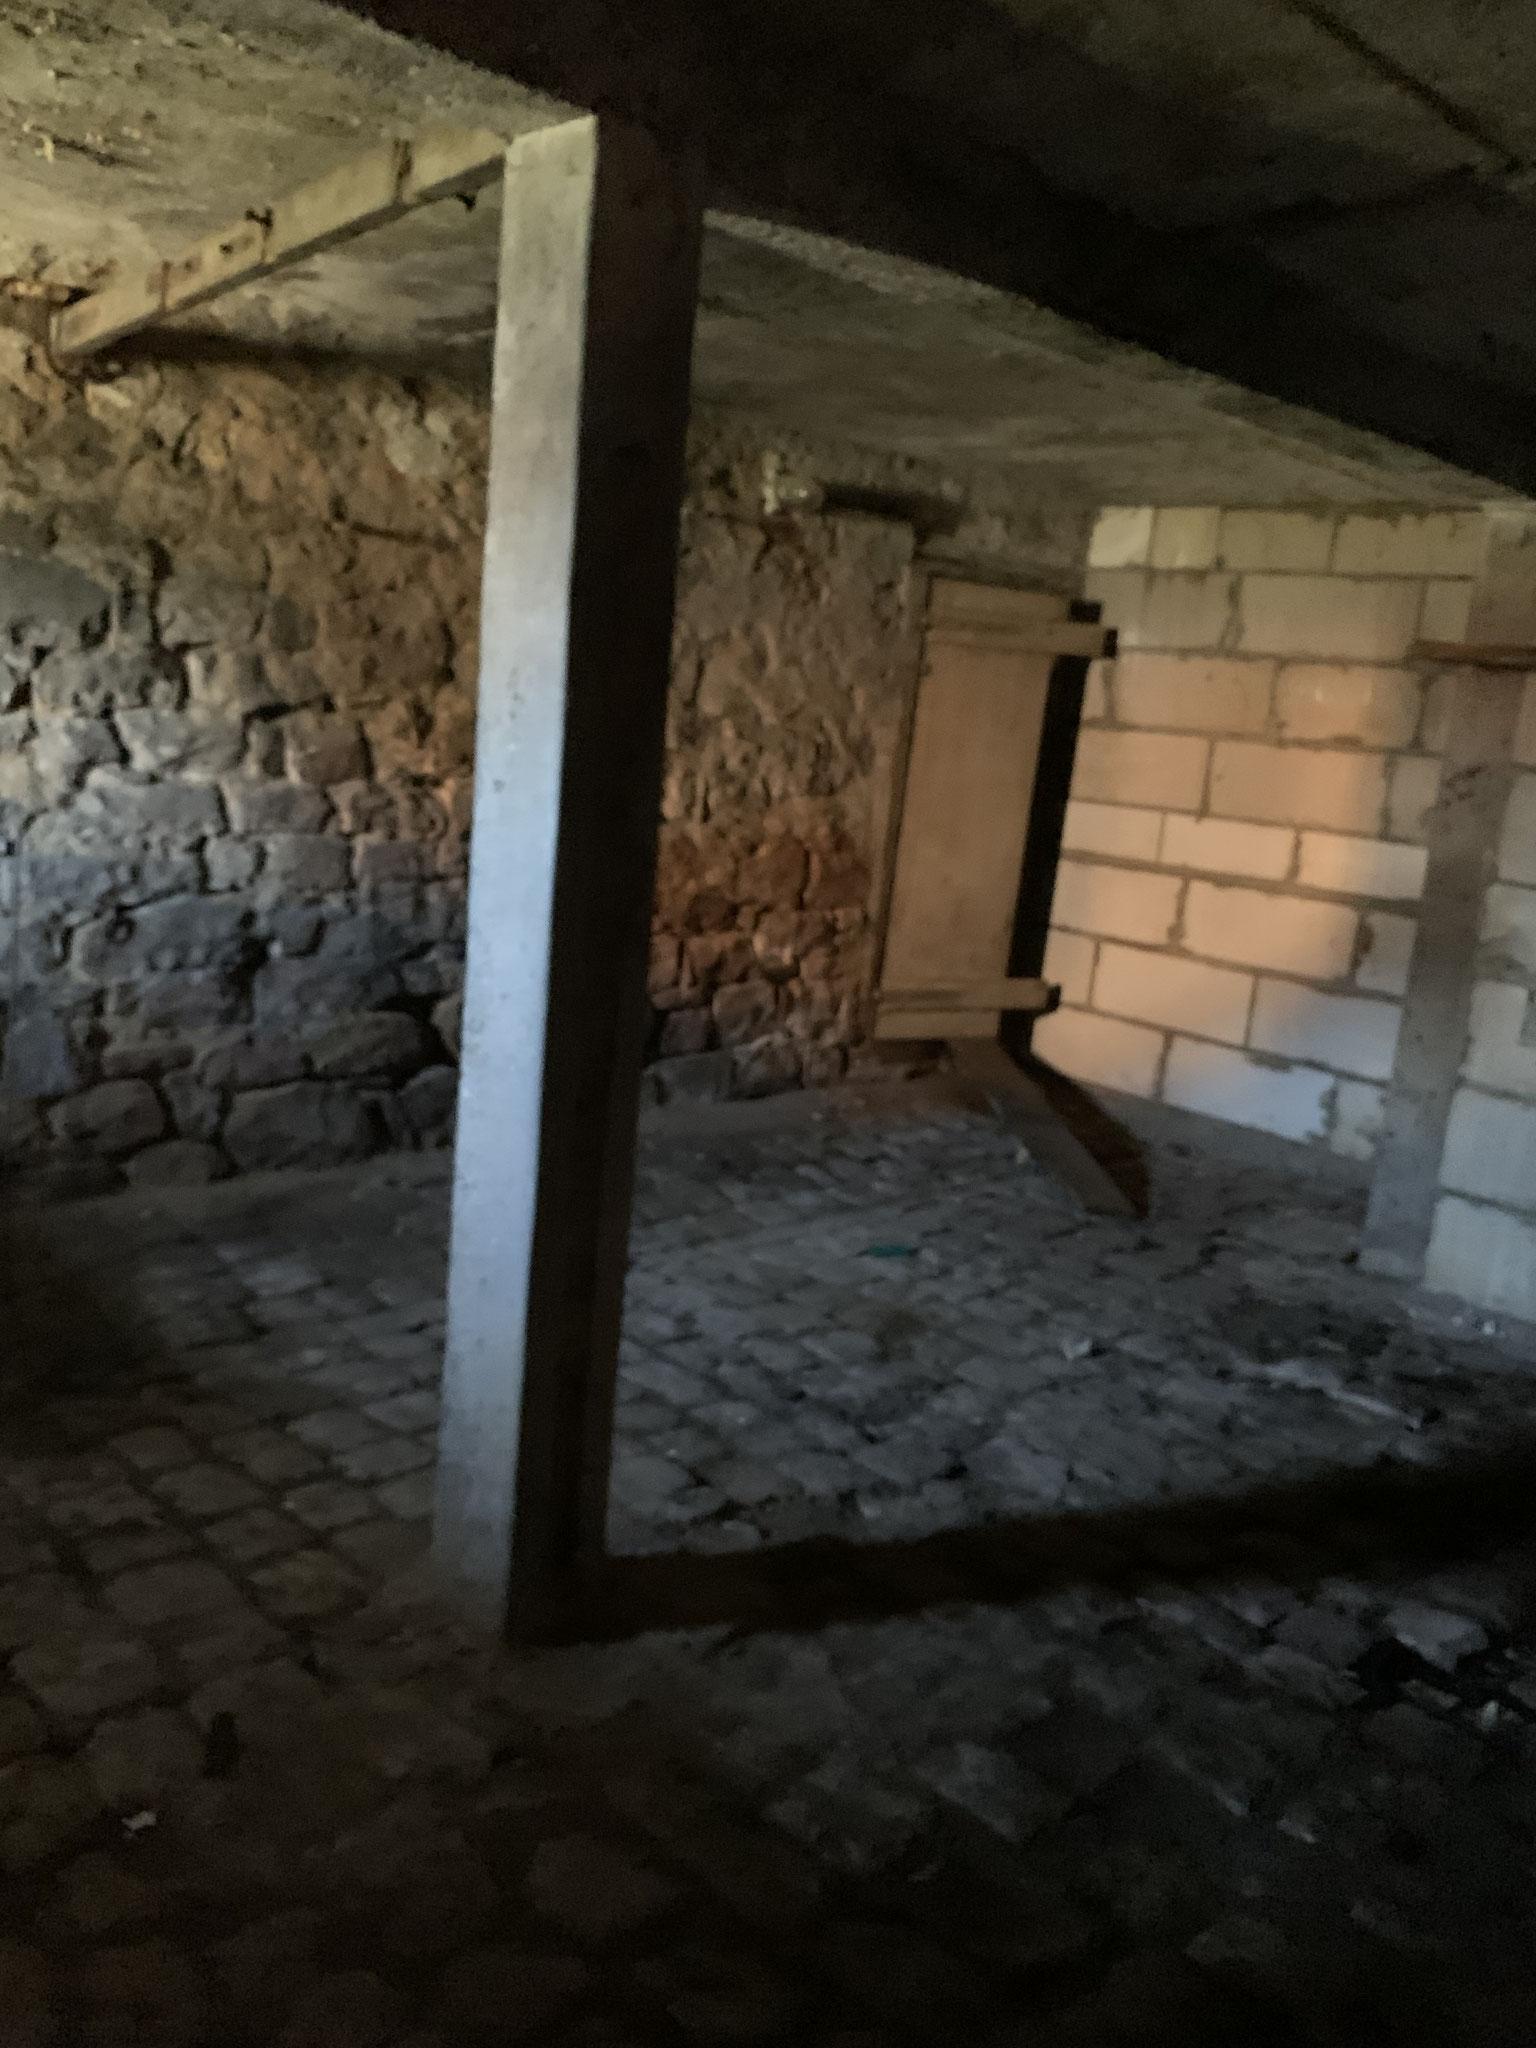 ehemaliger Kuhstall mit Durchgang zum Wohnhaus